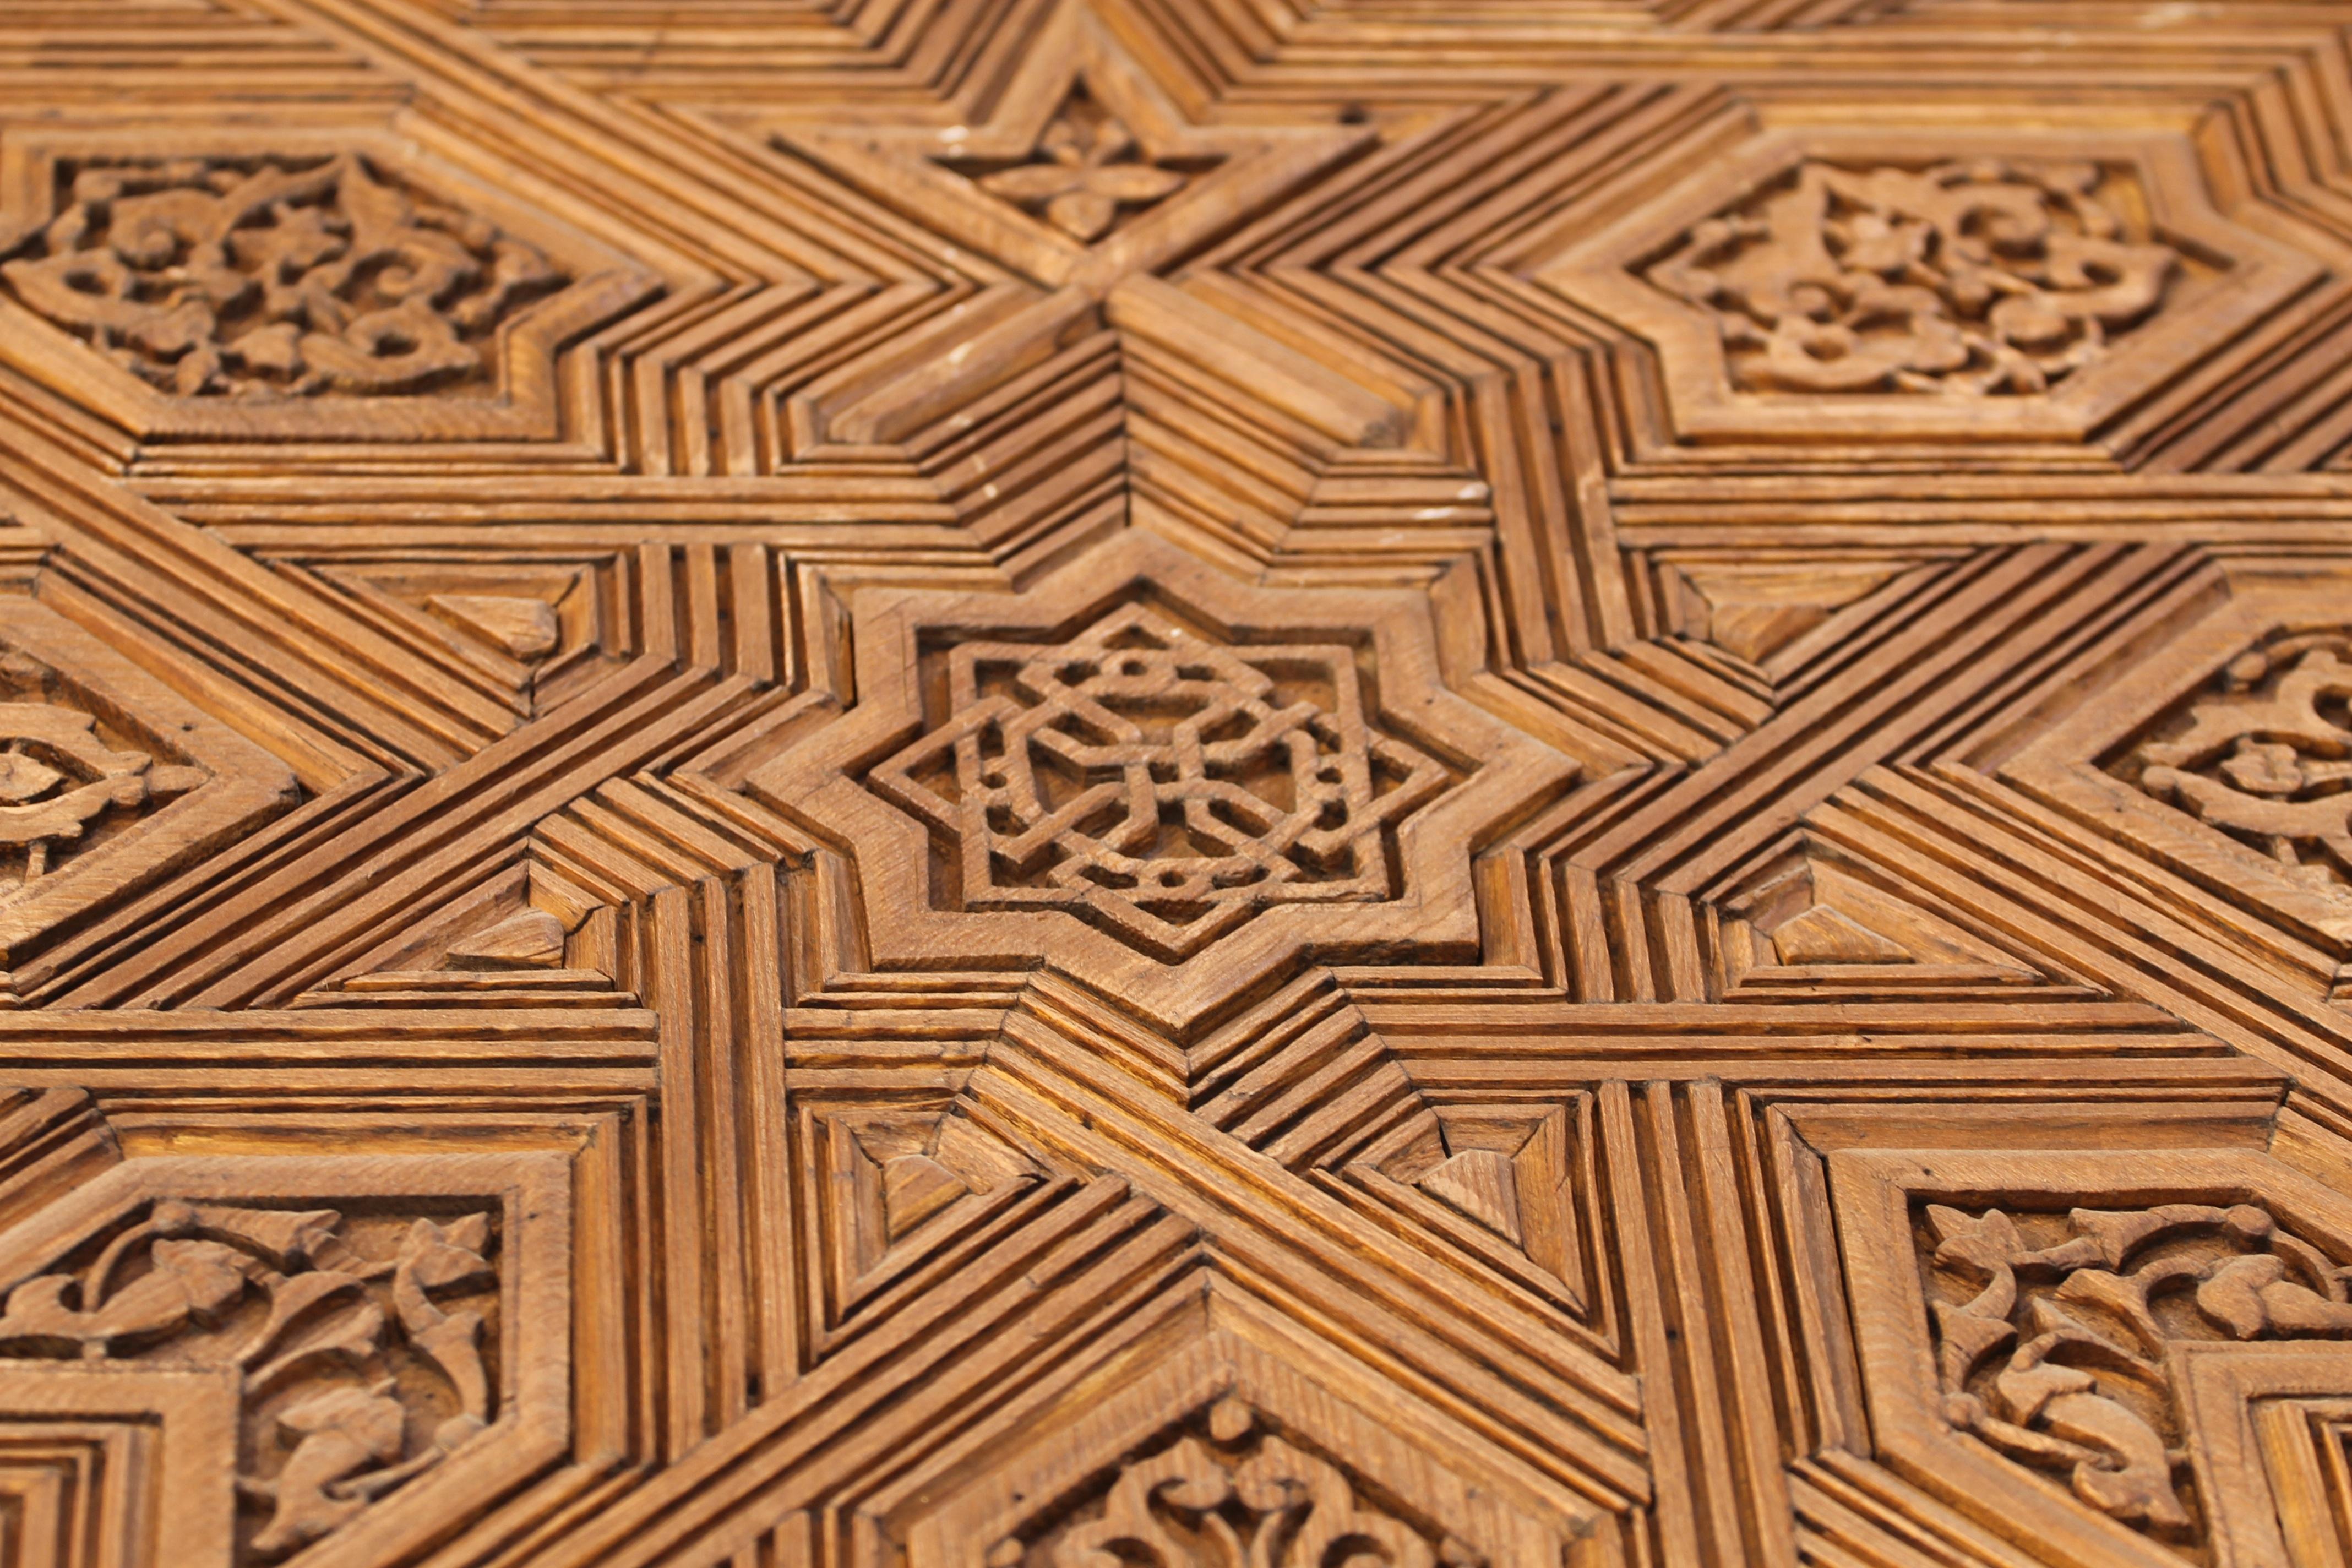 Fotos Gratis Arquitectura Textura Piso Palacio Monumento Patr Nea Azulejo Espa